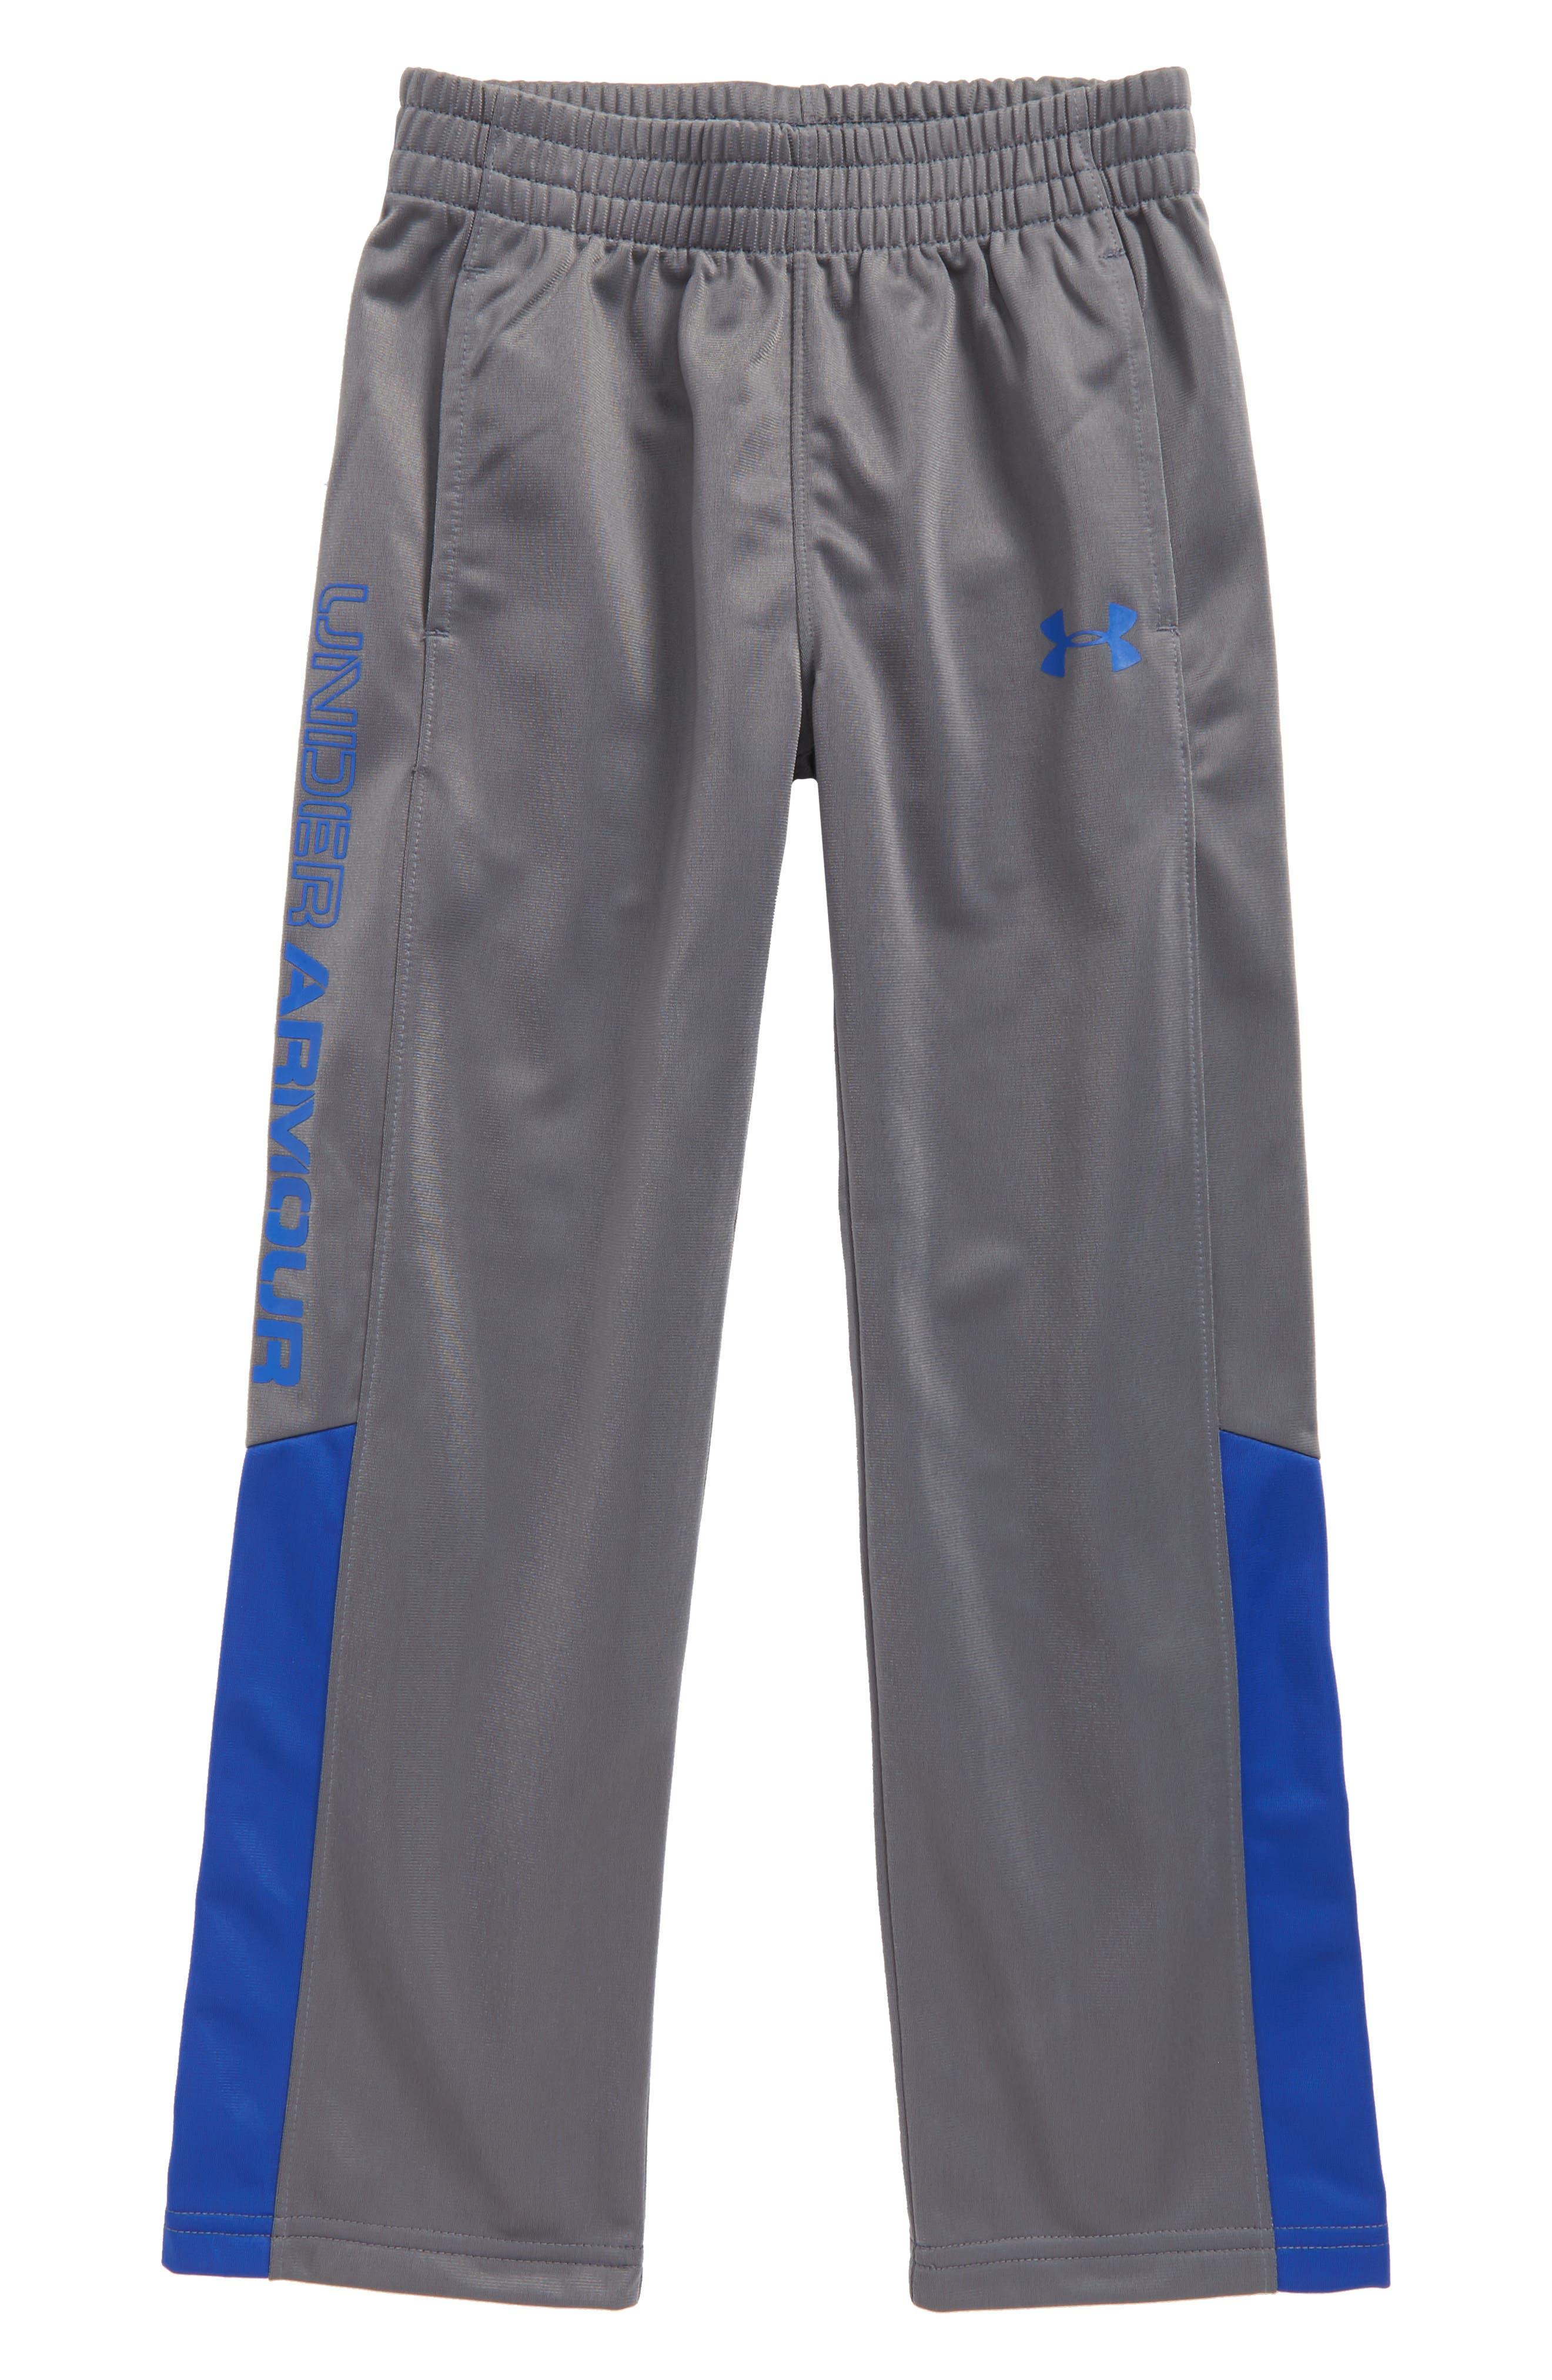 Brawler 2.0 Pants,                         Main,                         color, Graphite/ Royal